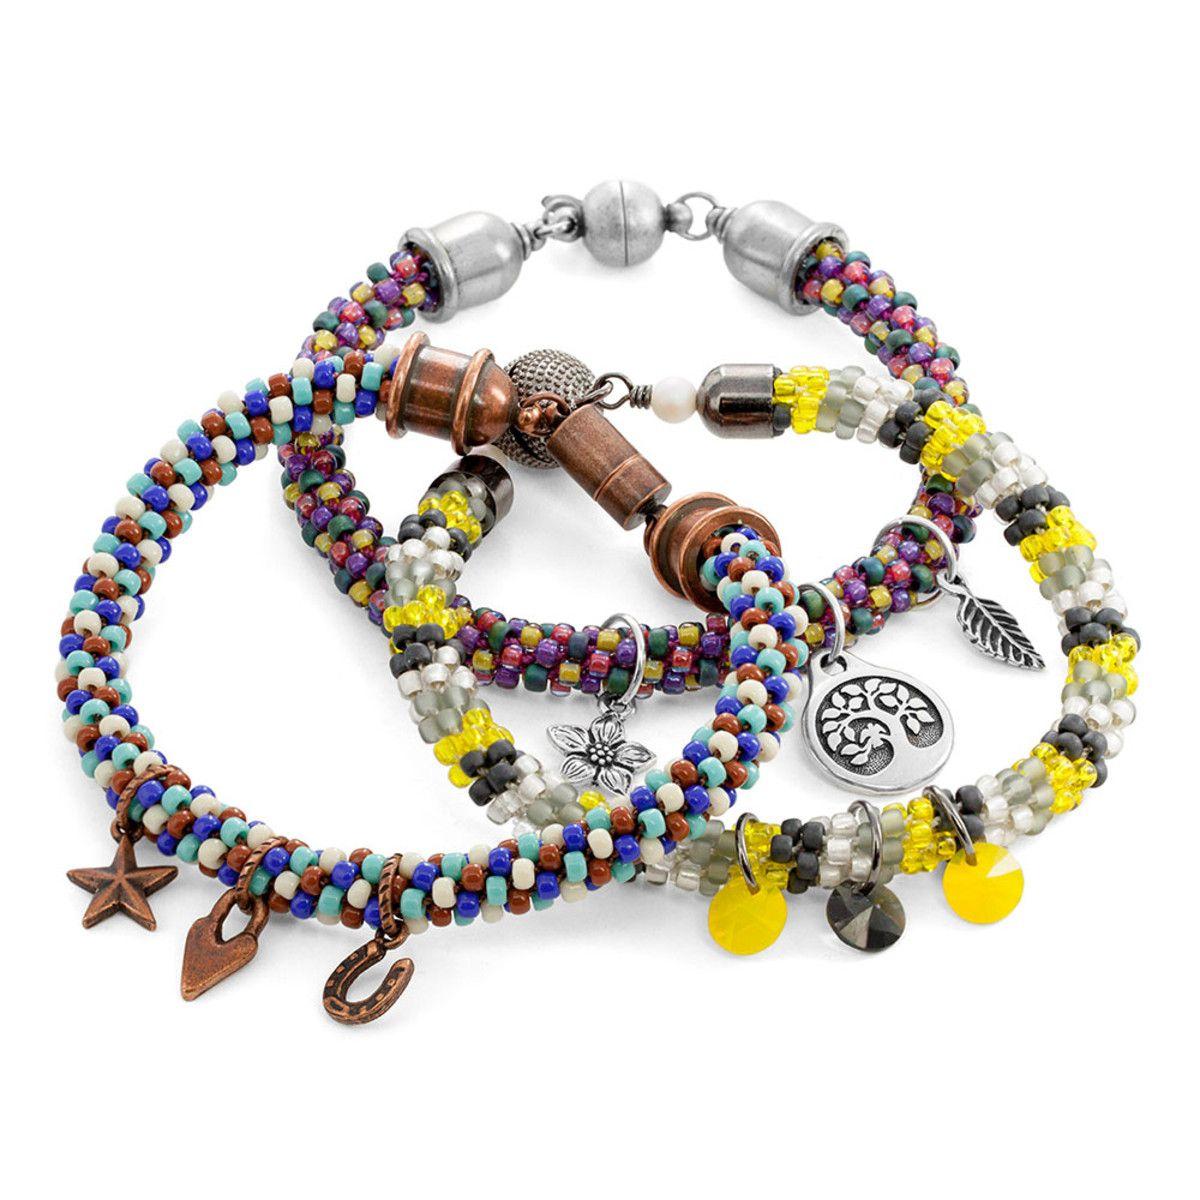 Kumihimo Charm Bracelet | Fusion Beads Inspiration Gallery